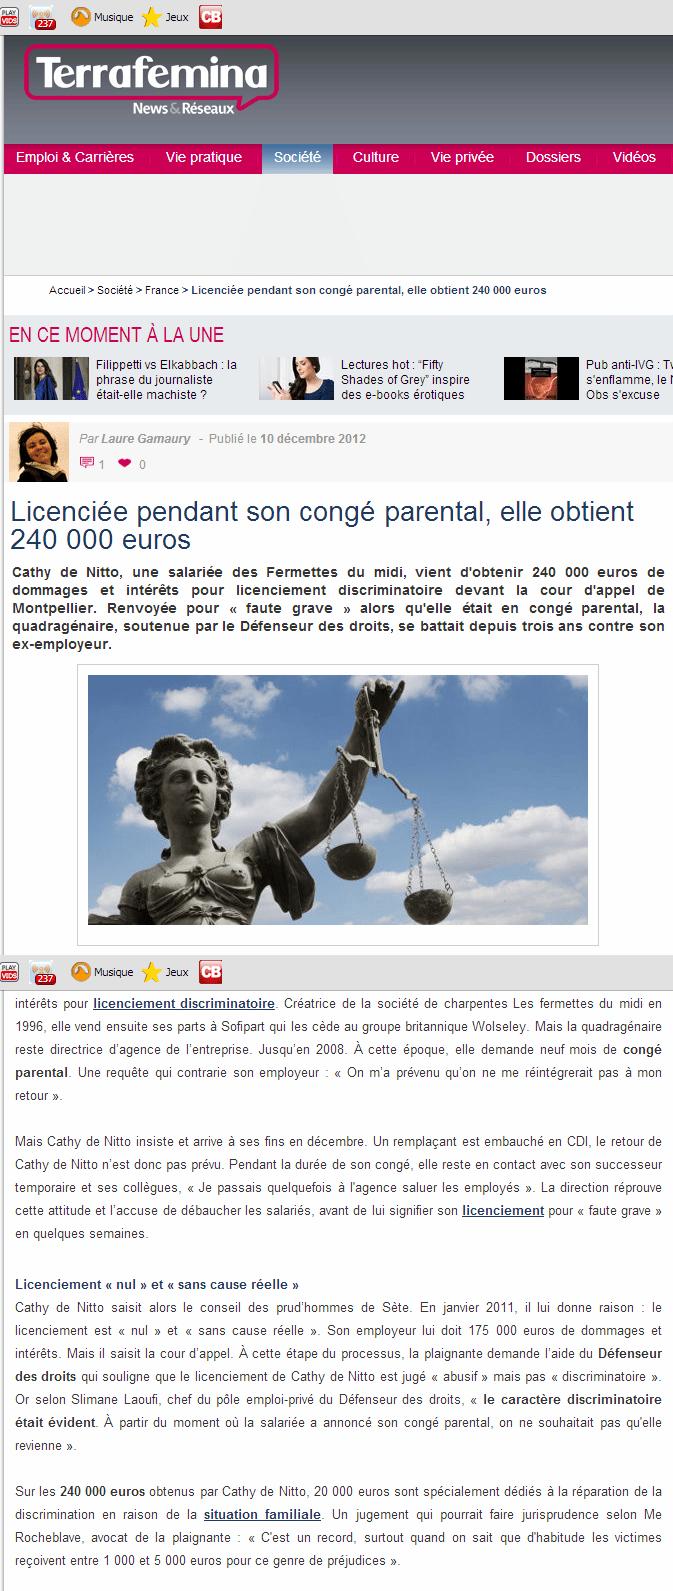 Licenciée-pendant-son-congé-parental-elle-obtient-240-000-euros-Terrafemina